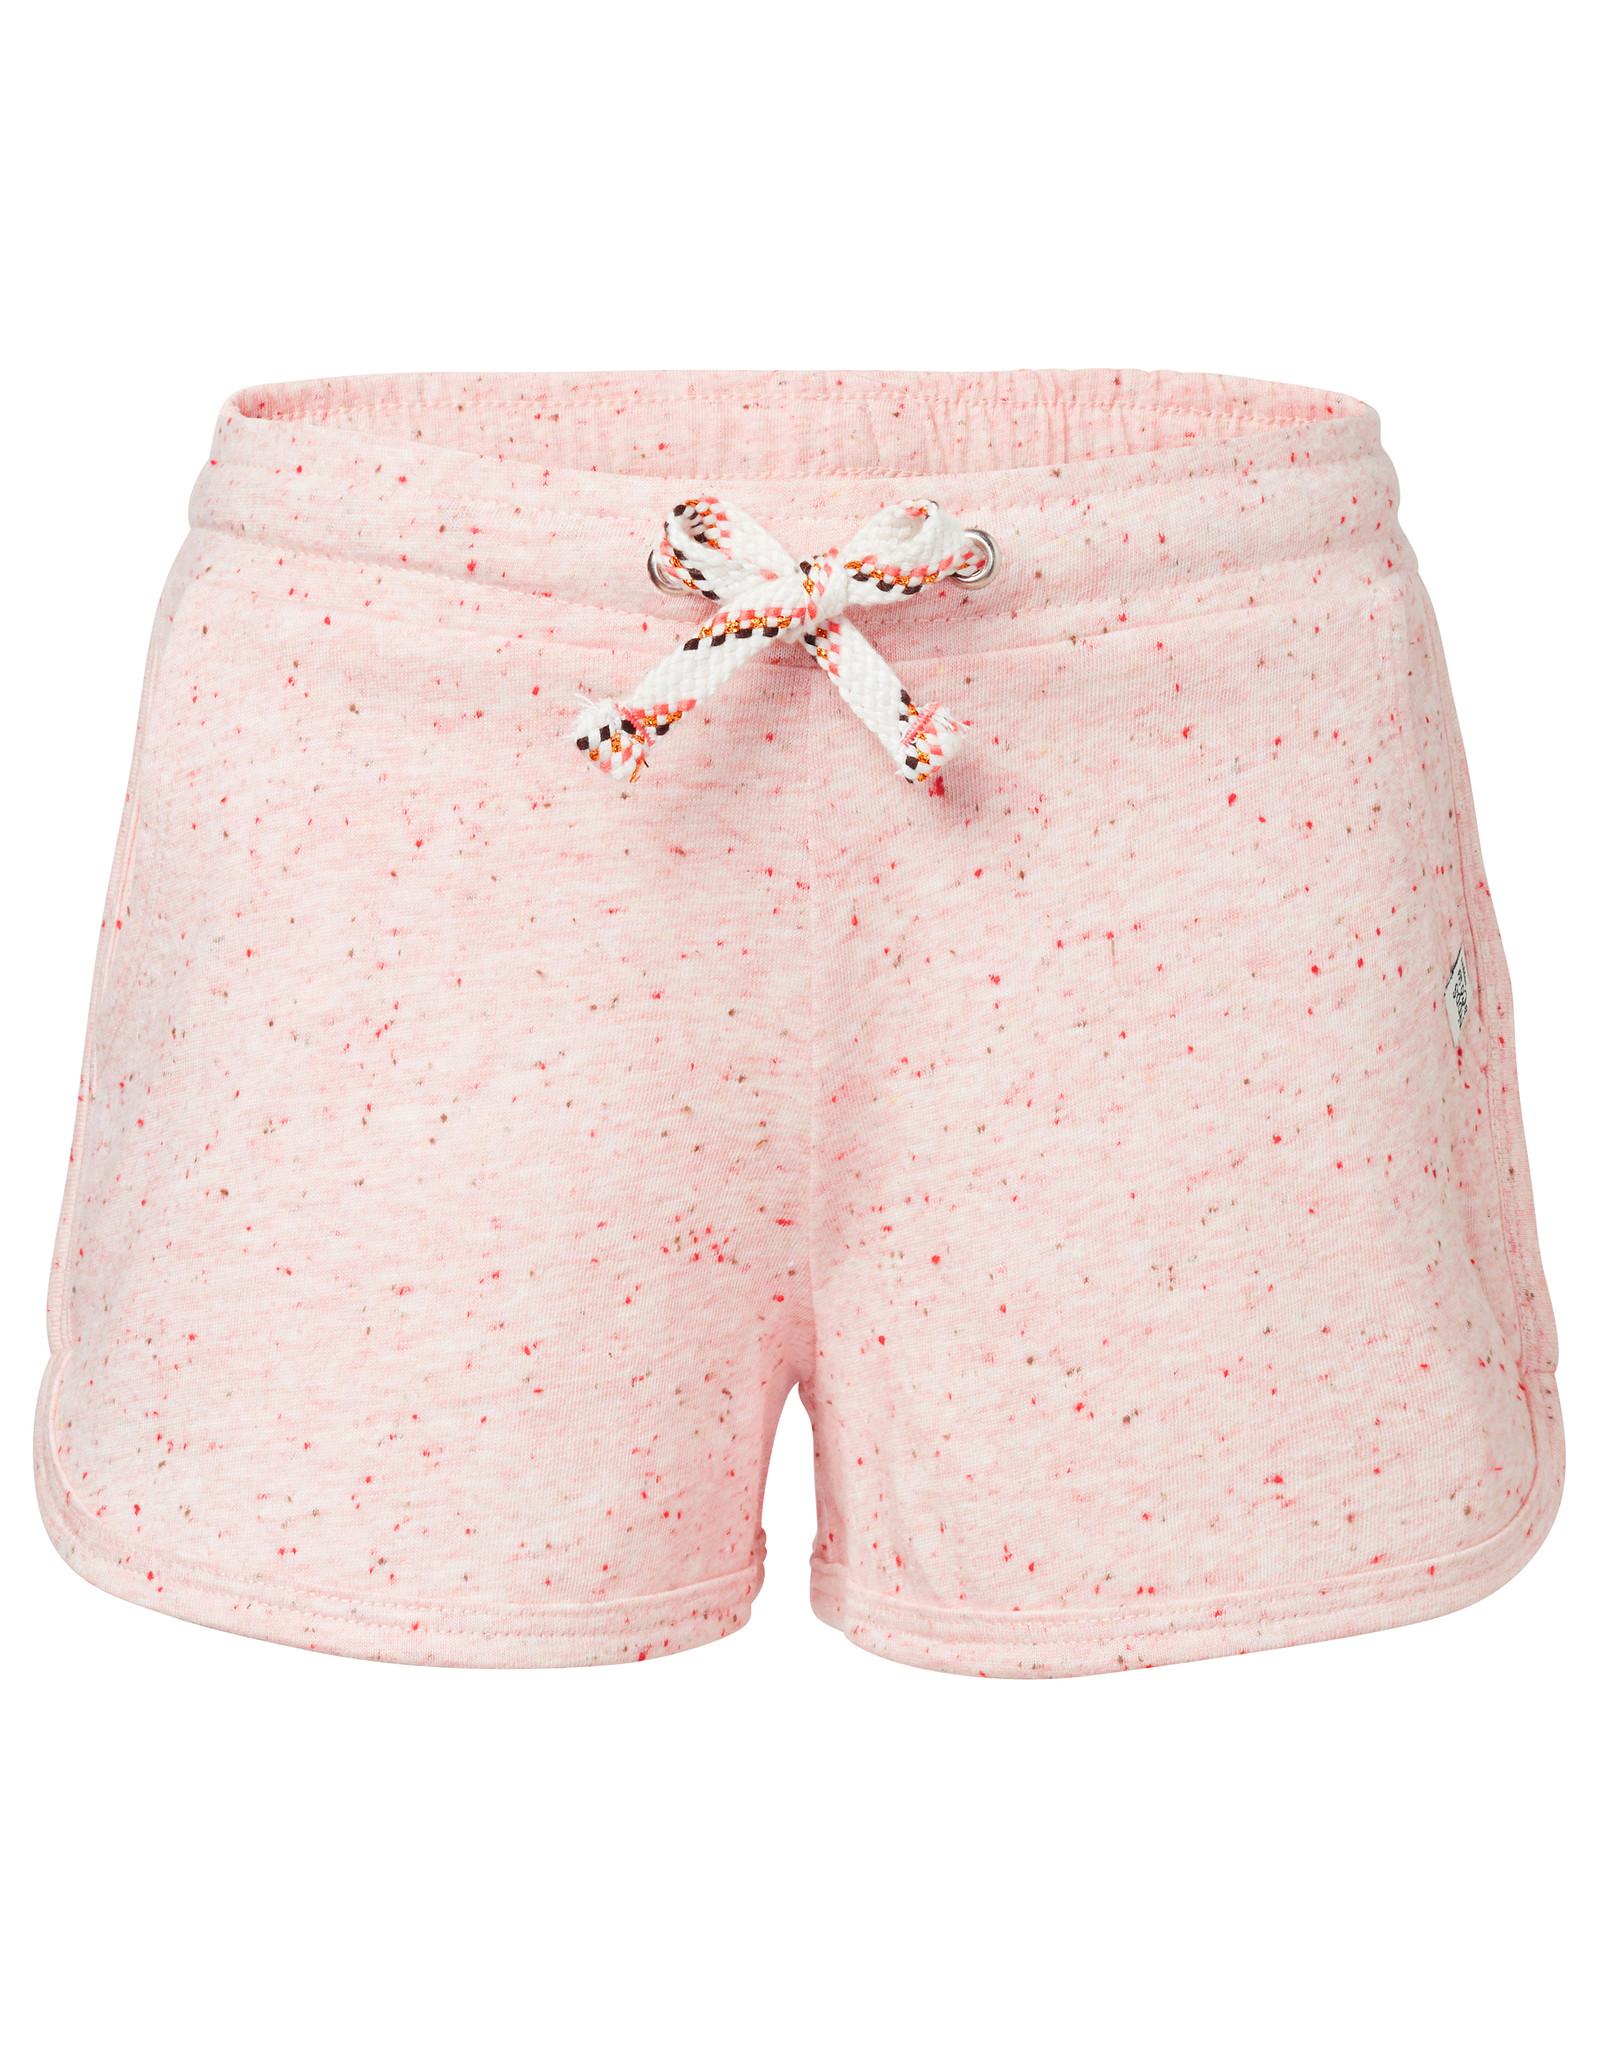 Noppies G Short Linnsmore, Creole Pink